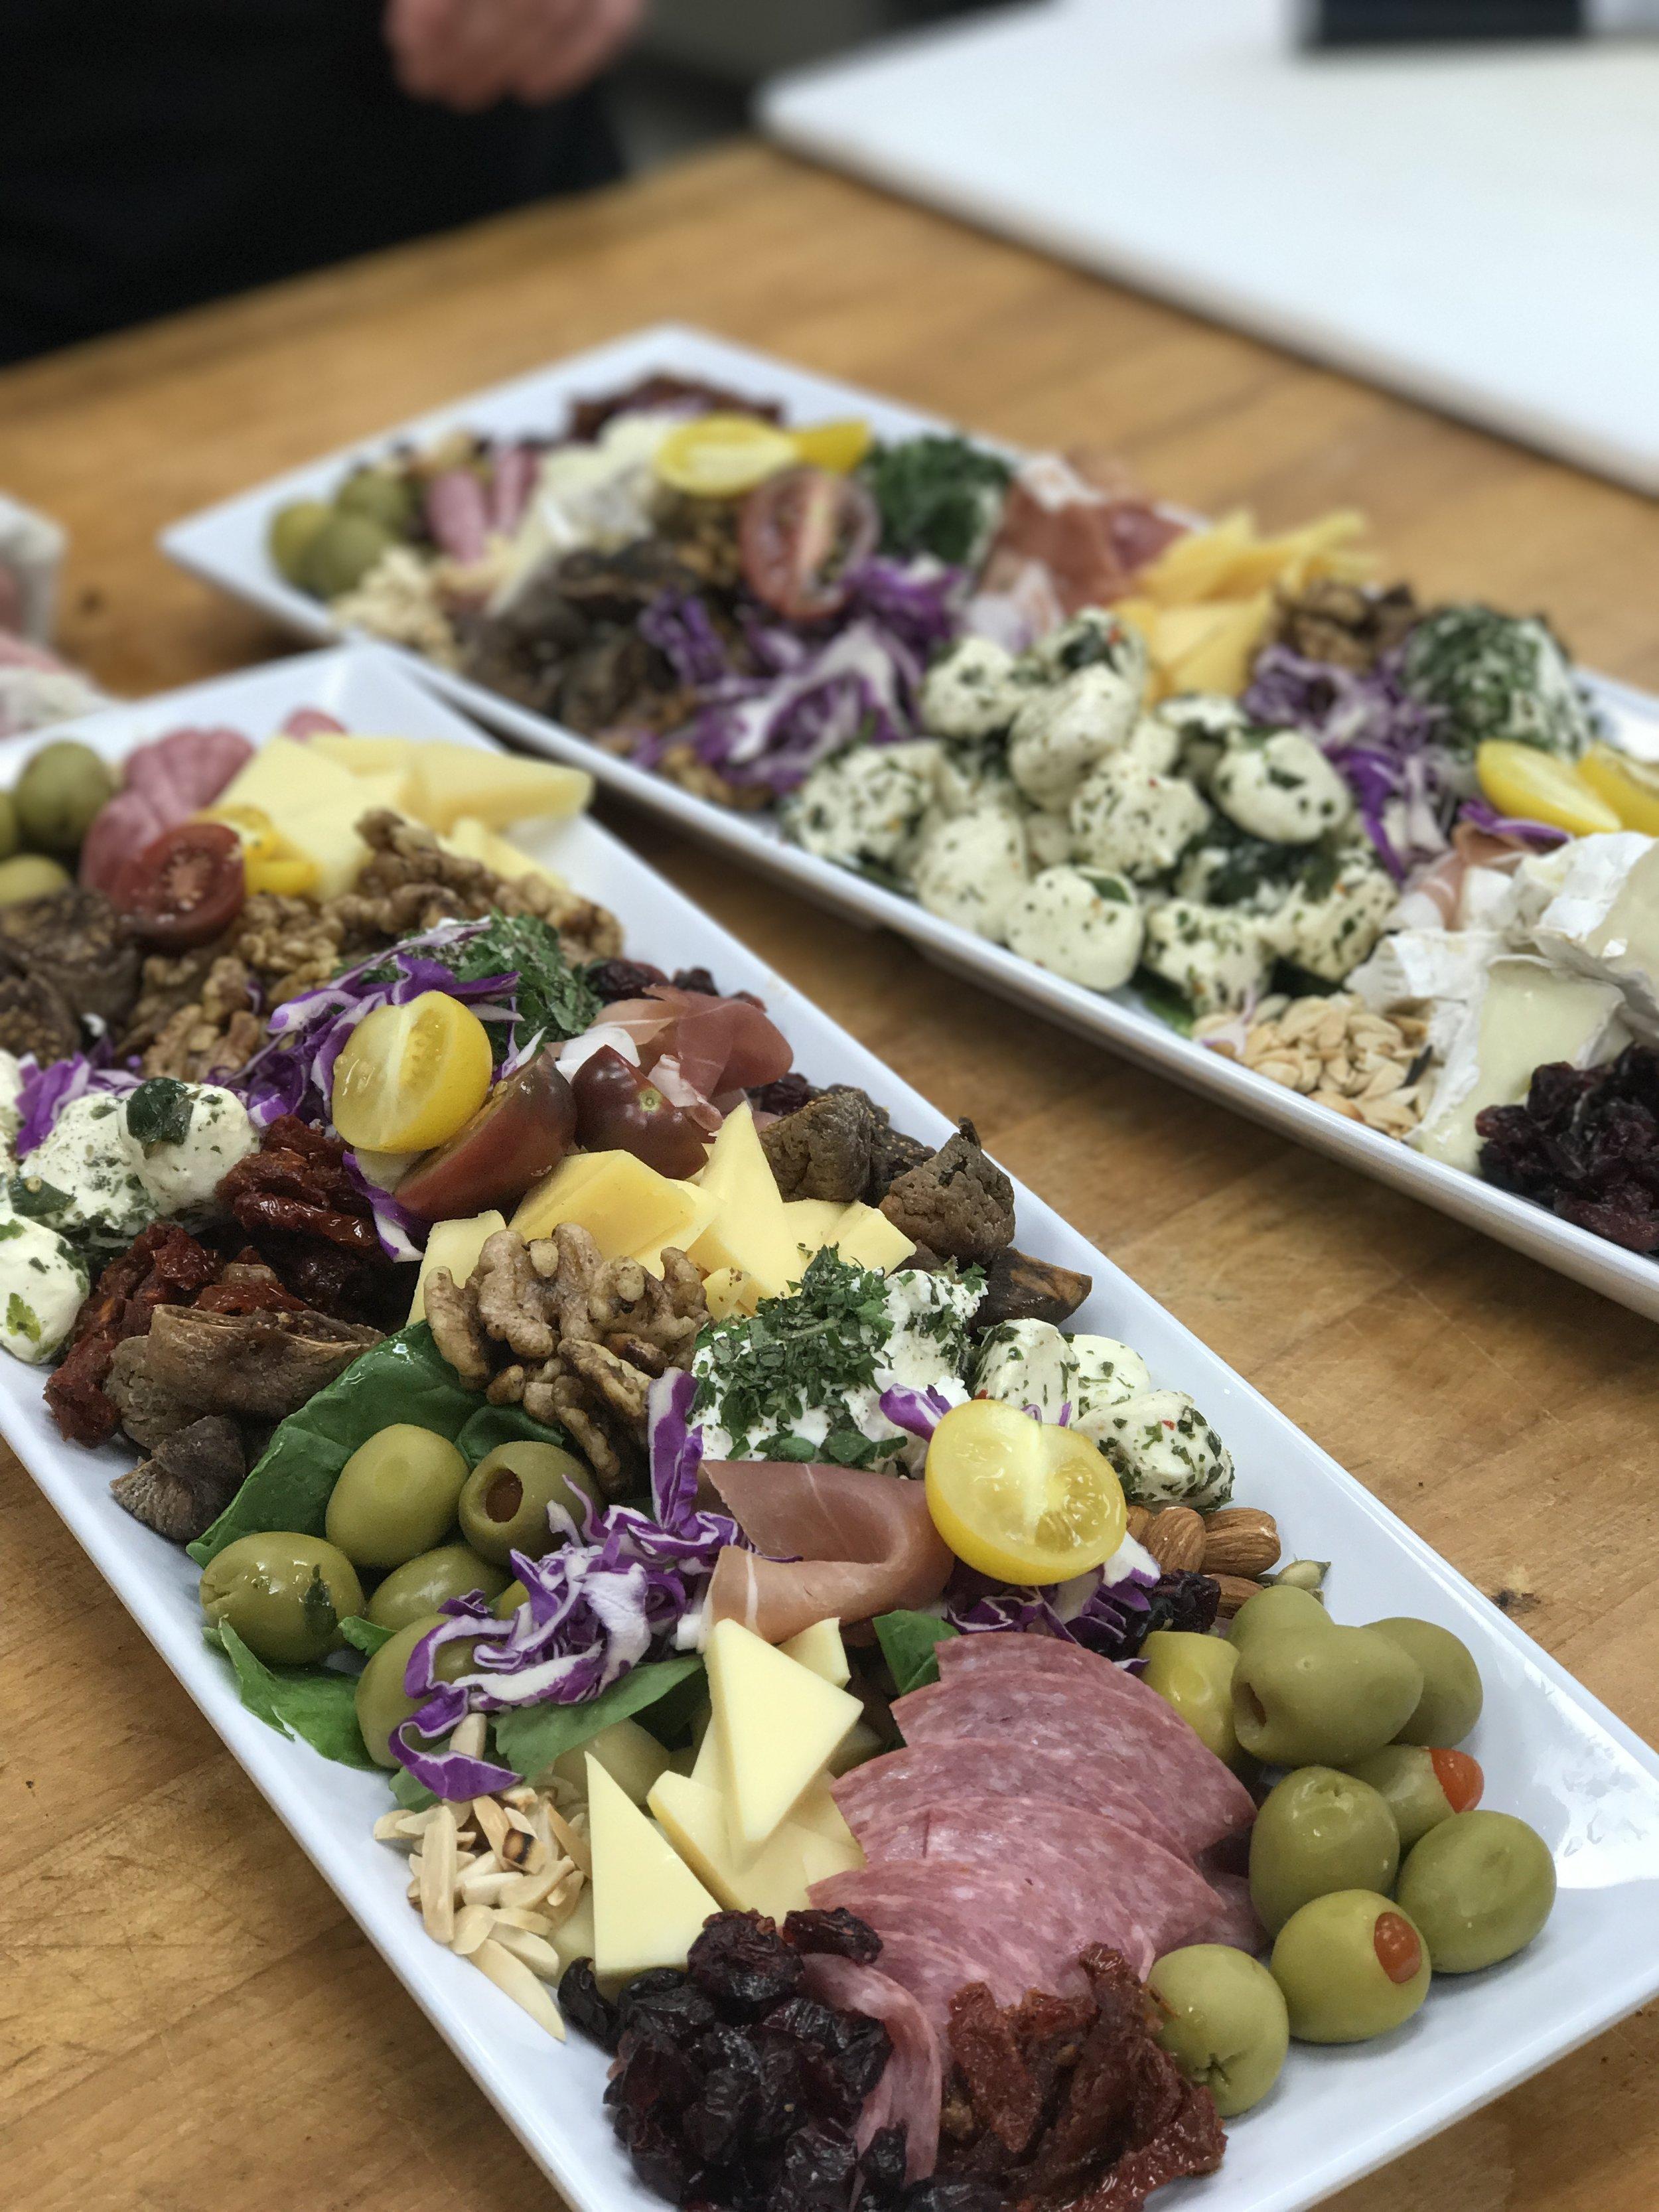 Photo Oct box-lunches-breakfast-buffett-appetizers-full-buffett-office-catering-lenexa-mission-hills-plaza-kcmo-organic7.jpg